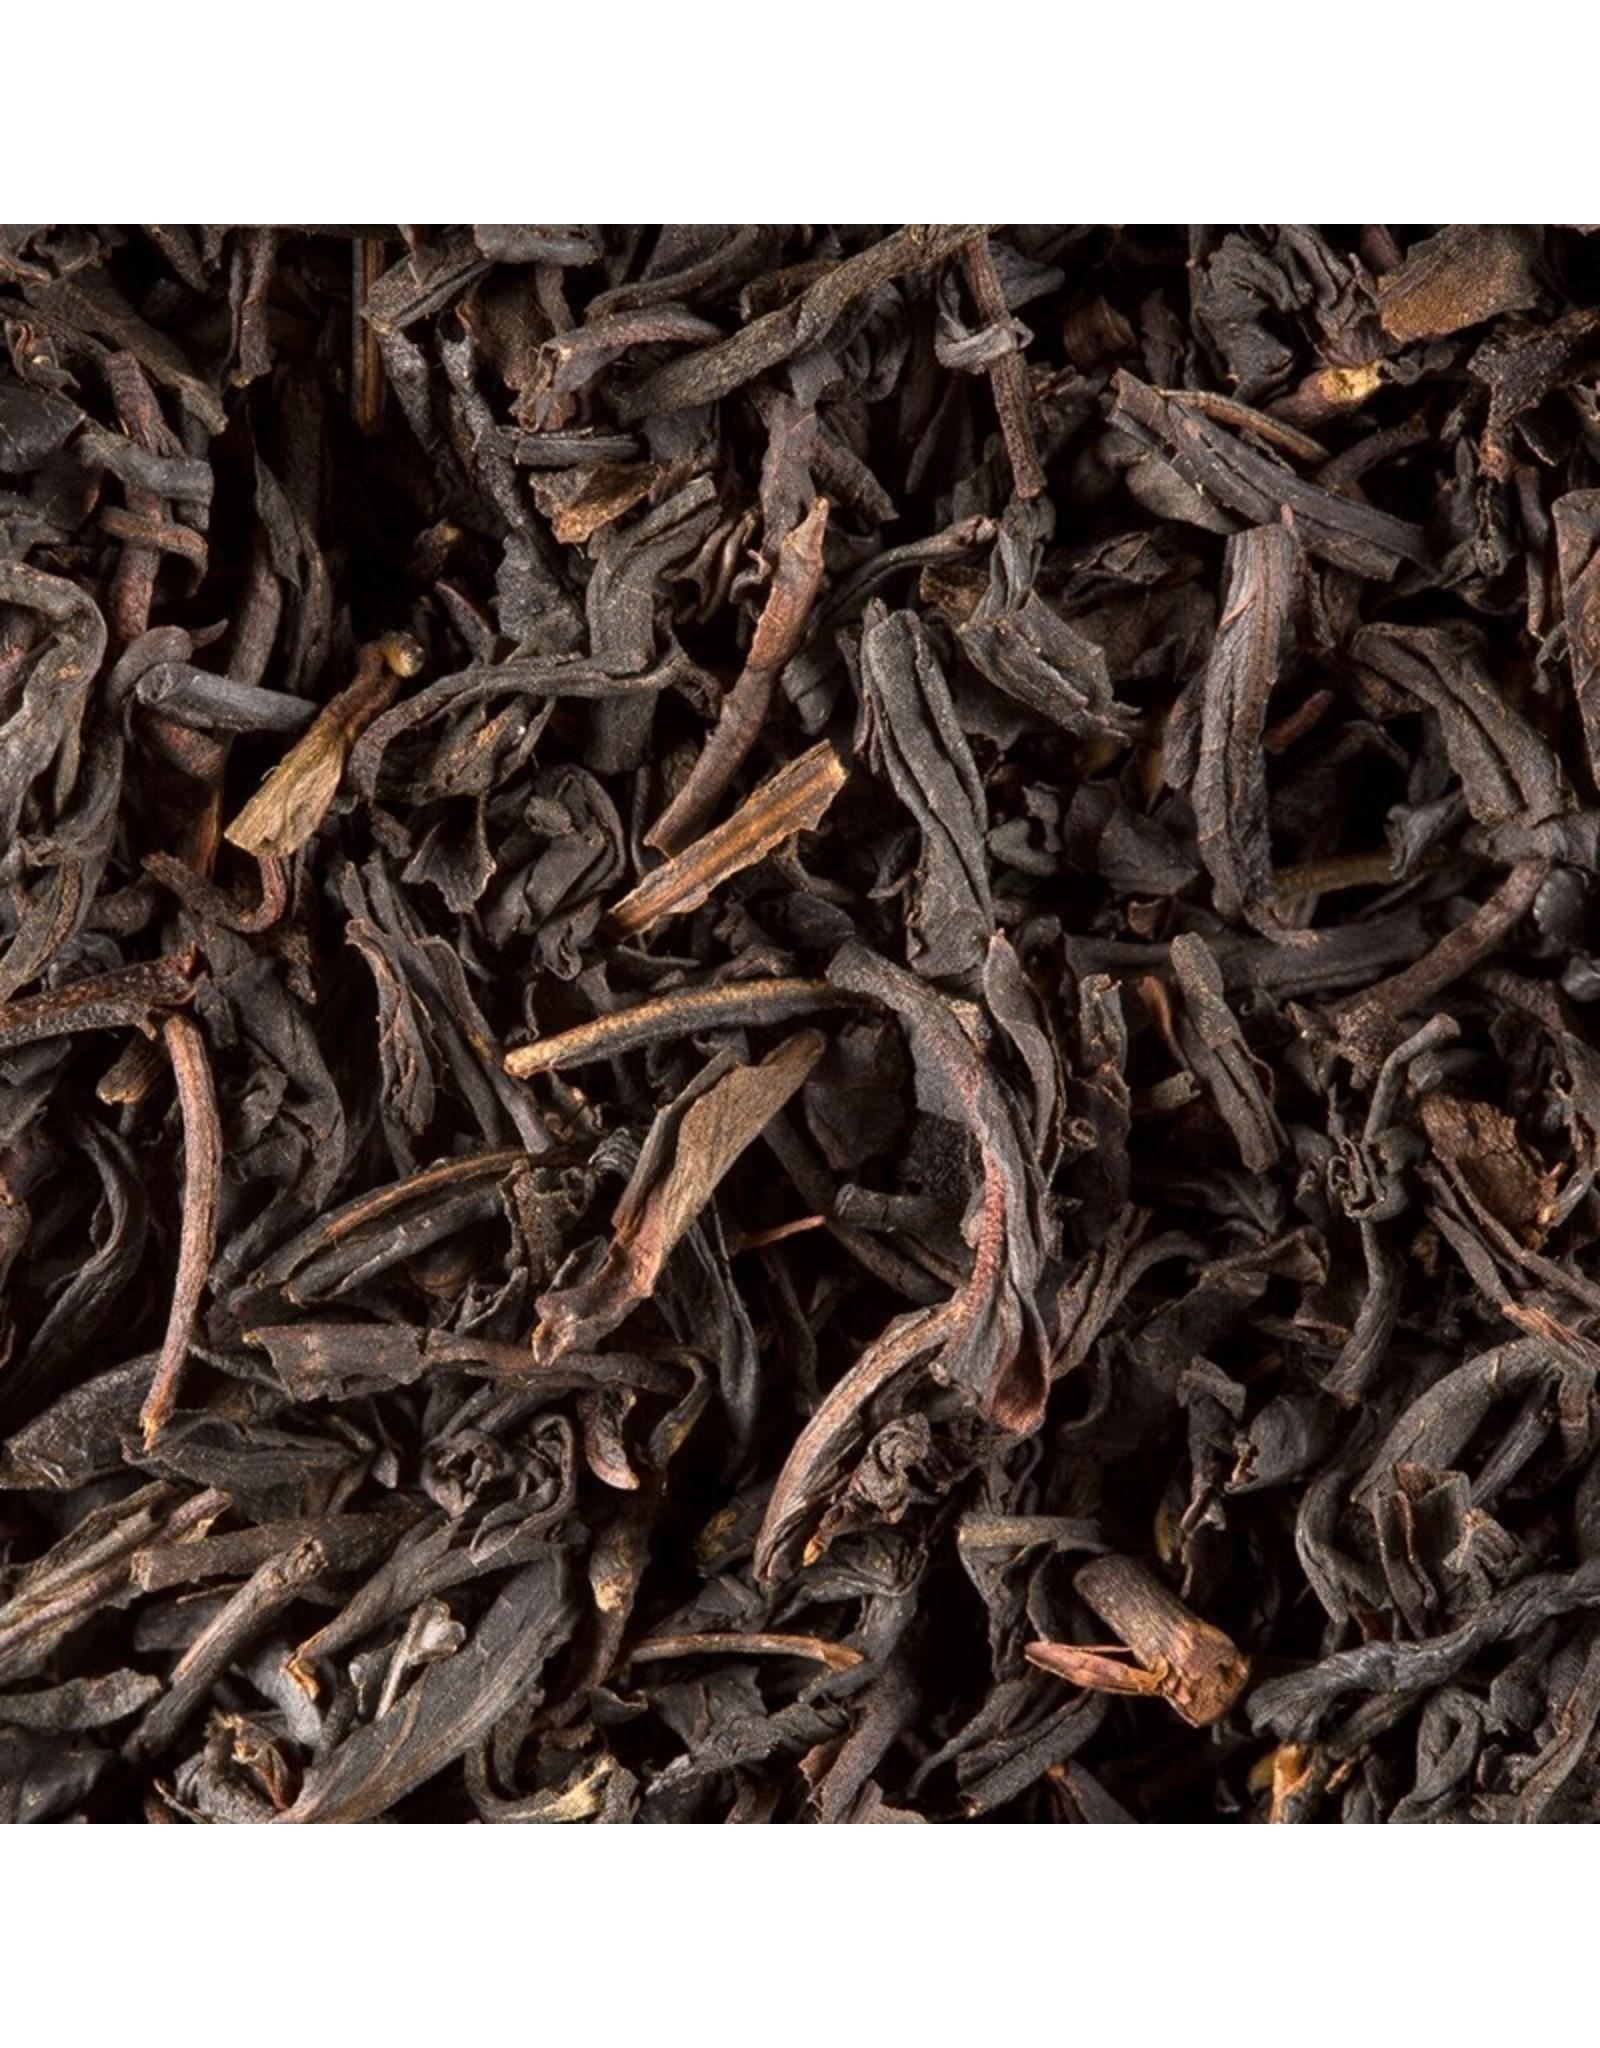 Dammann 'Darjeeling' Black tea